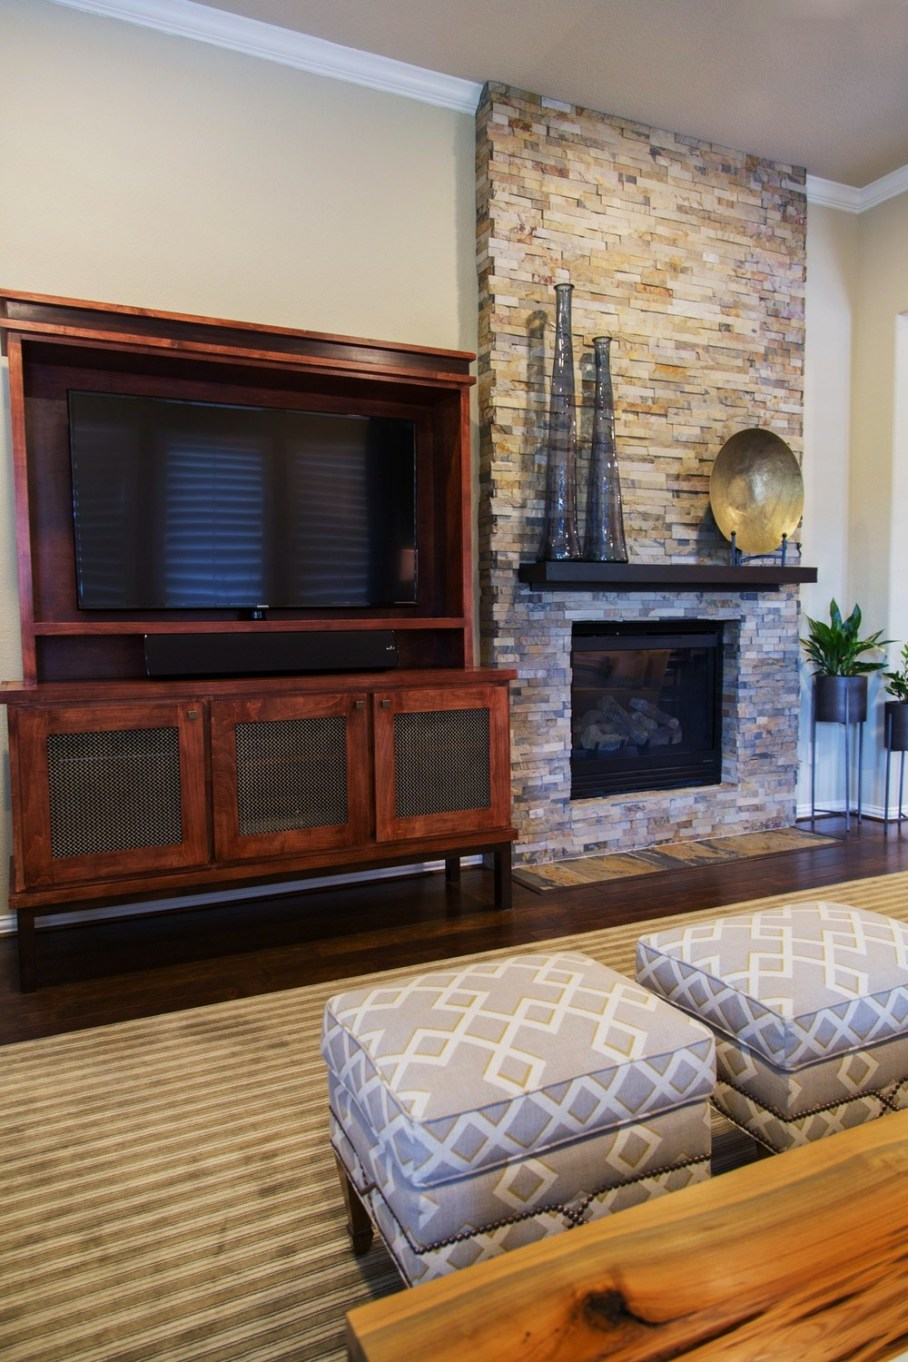 Fireplace room remodel; tv; entertainment center; rug; decor;| Interior Designer: Carla Aston / Photography by Tori Aston